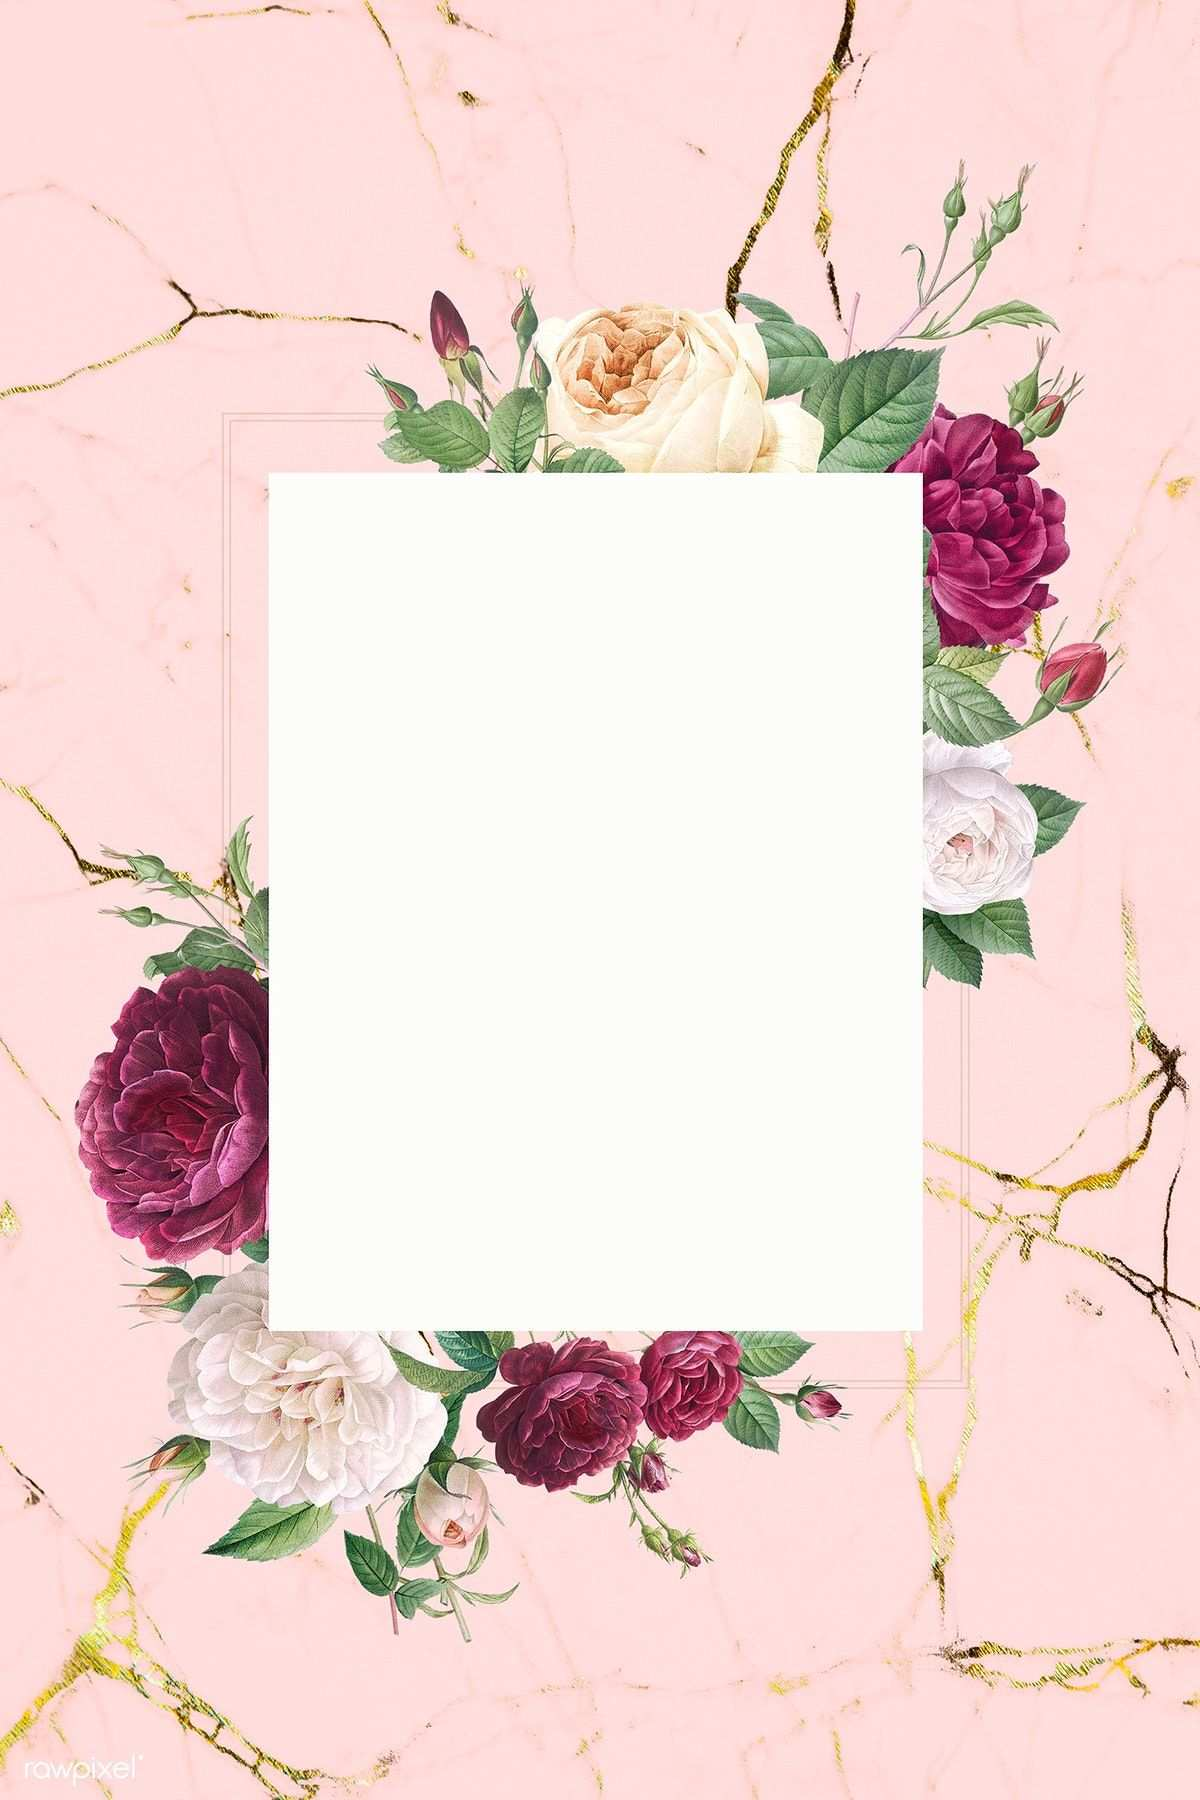 Download Premium Illustration Of Rectangular Frame Decorated With Roses Floral Poster Flower Background Wallpaper Rose Frame